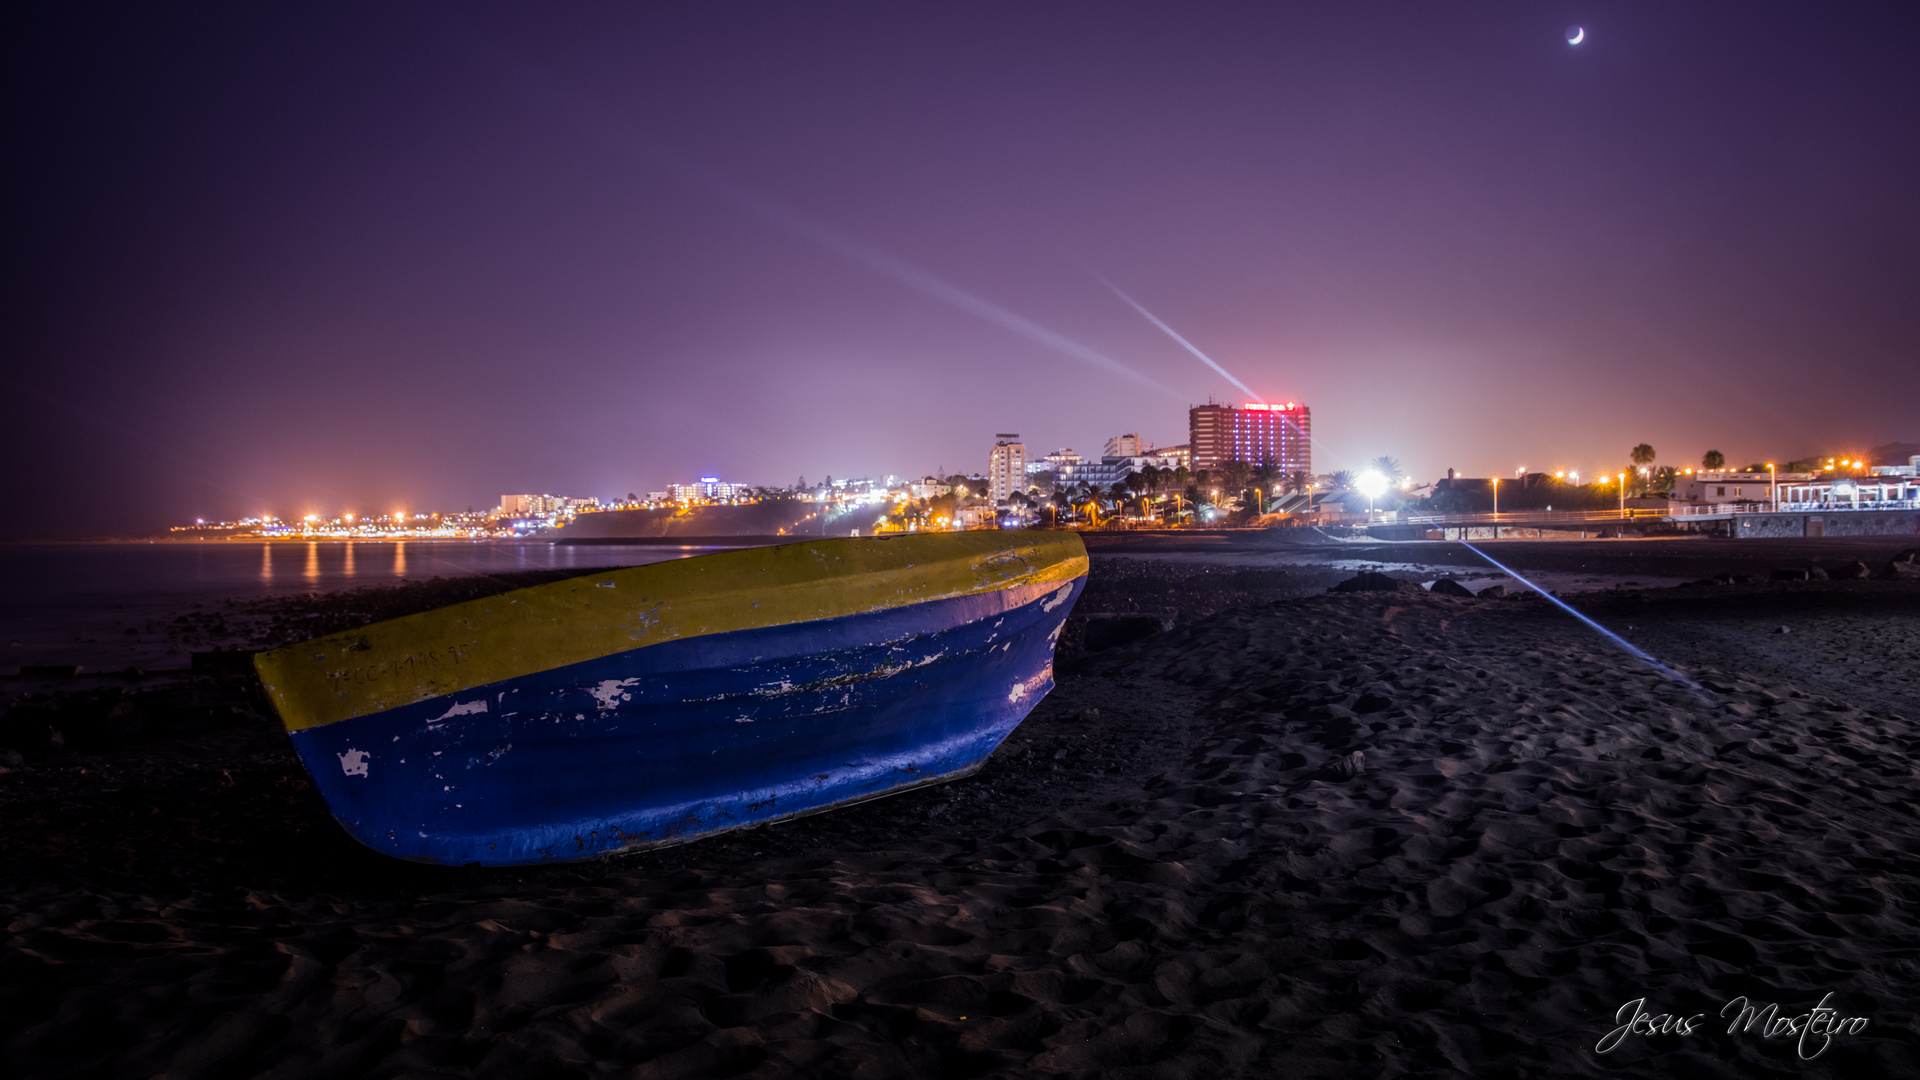 Barca, Playa de San Agustin